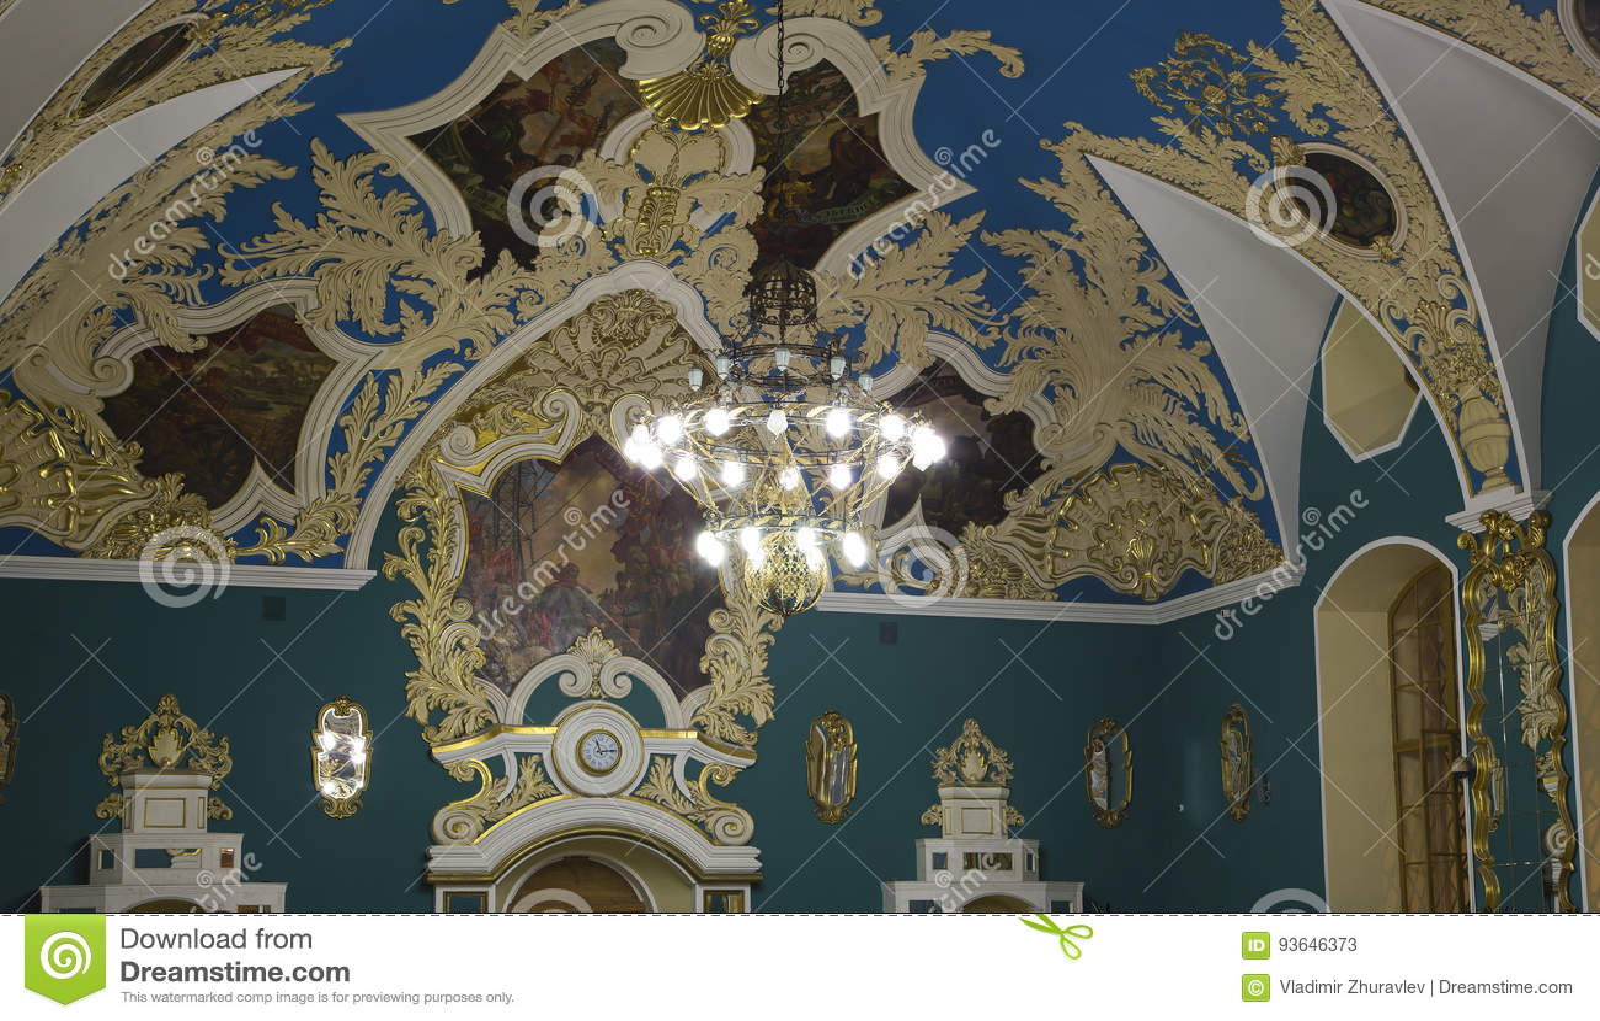 VIP-αίθουσα ή ένας υψηλότερος σταθμός Kazansky Kazansky άνεσης δωματίων σιδηροδρομικός vokzal --είναι ένα από εννέα τερματικά σιδ